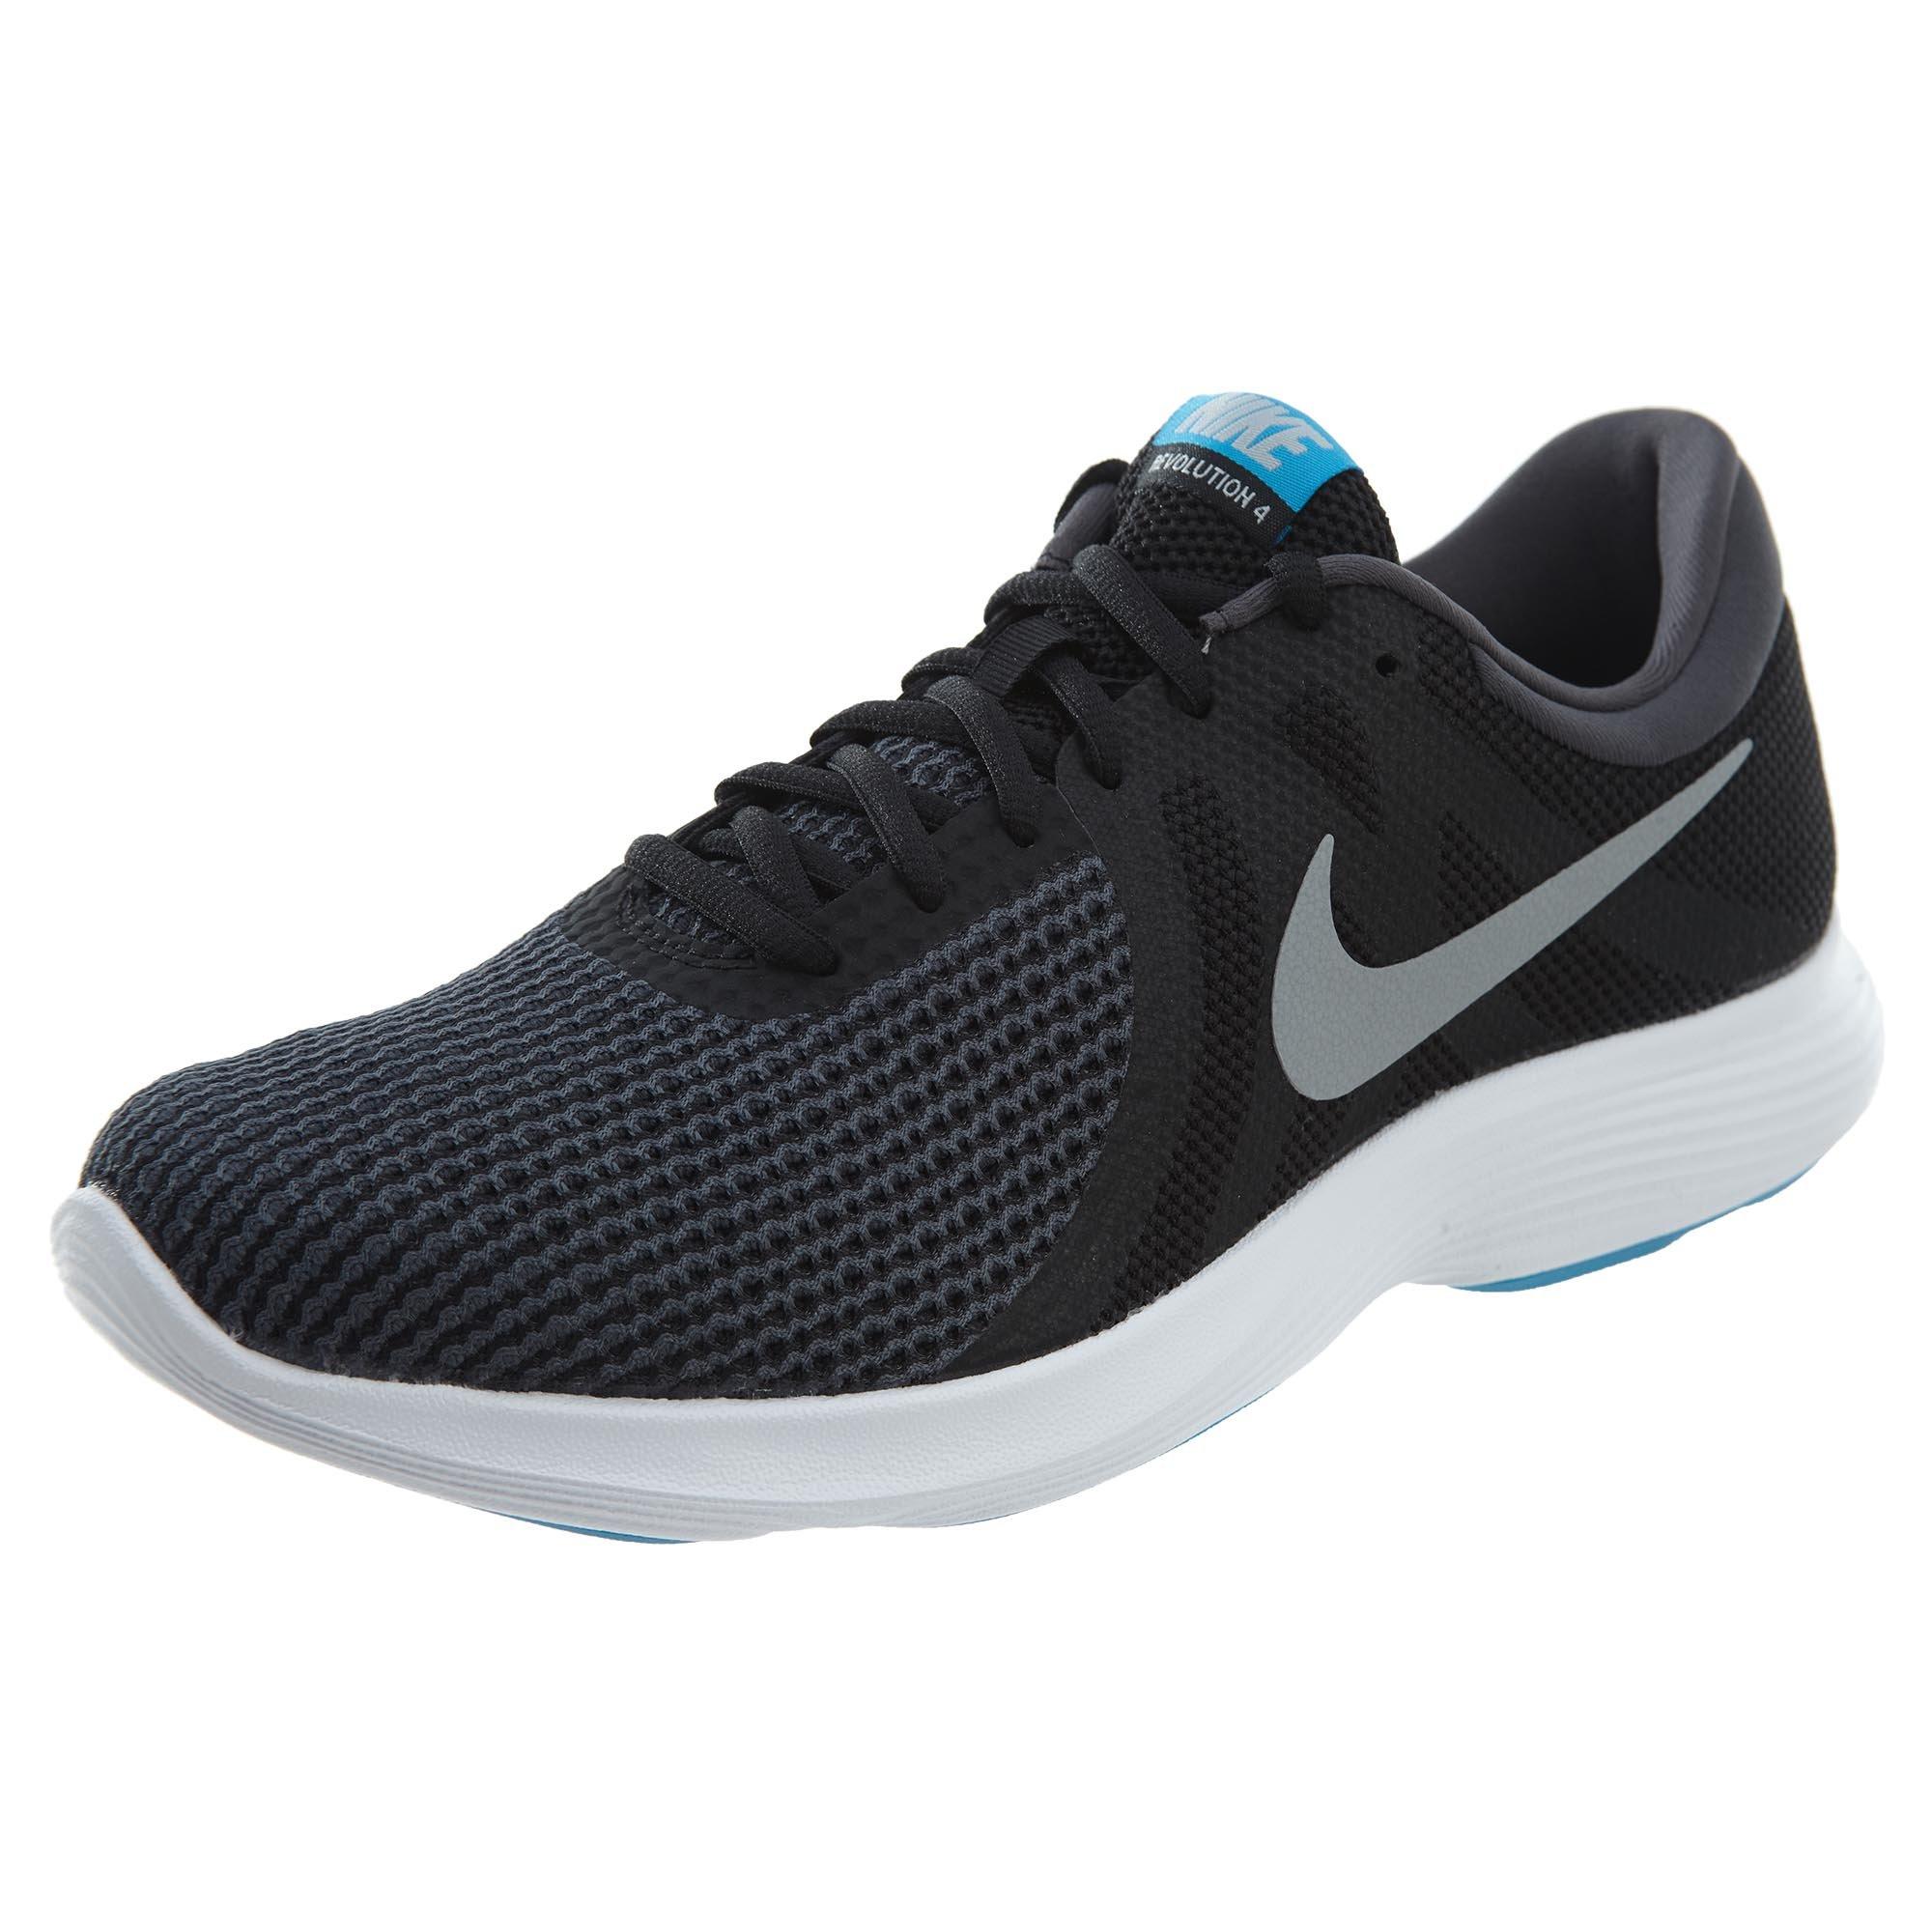 8971b85b4c198 Galleon - Nike Revolution 4 Mens 908988-005 Size 12